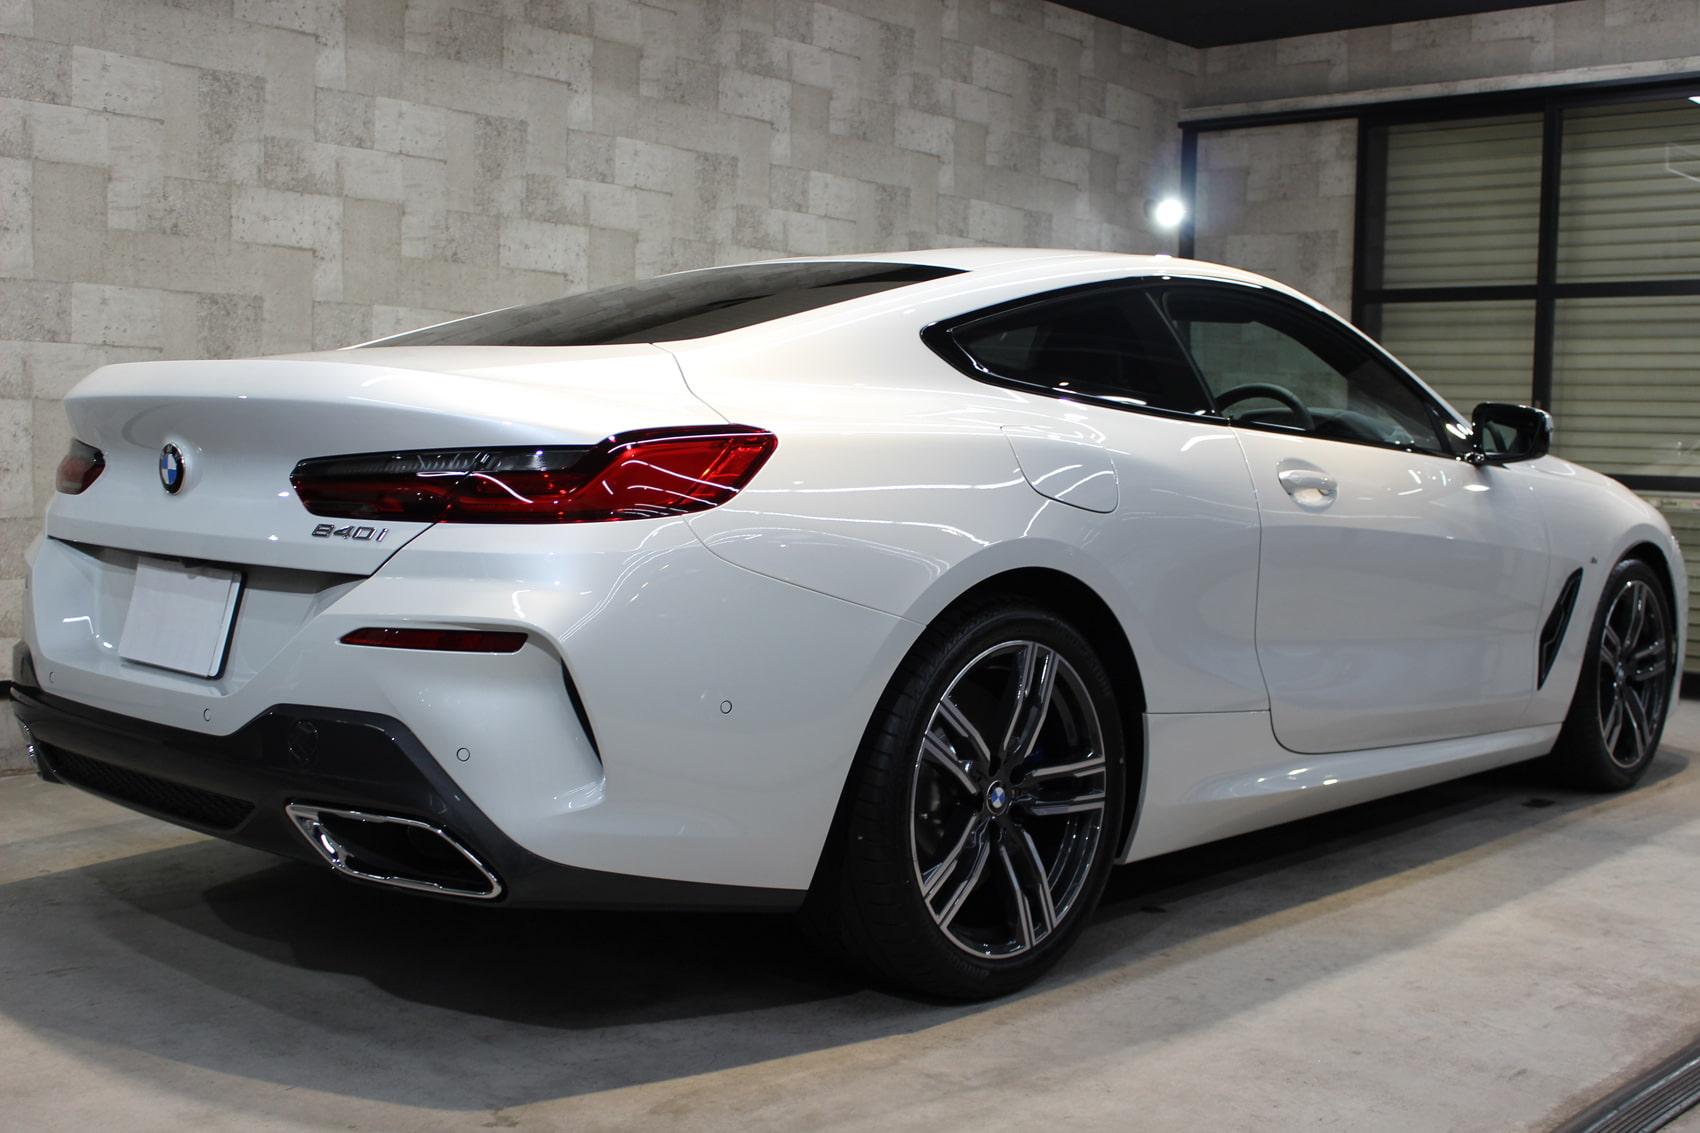 BMW 840iクーペ ミネラルホワイト リアバンパー